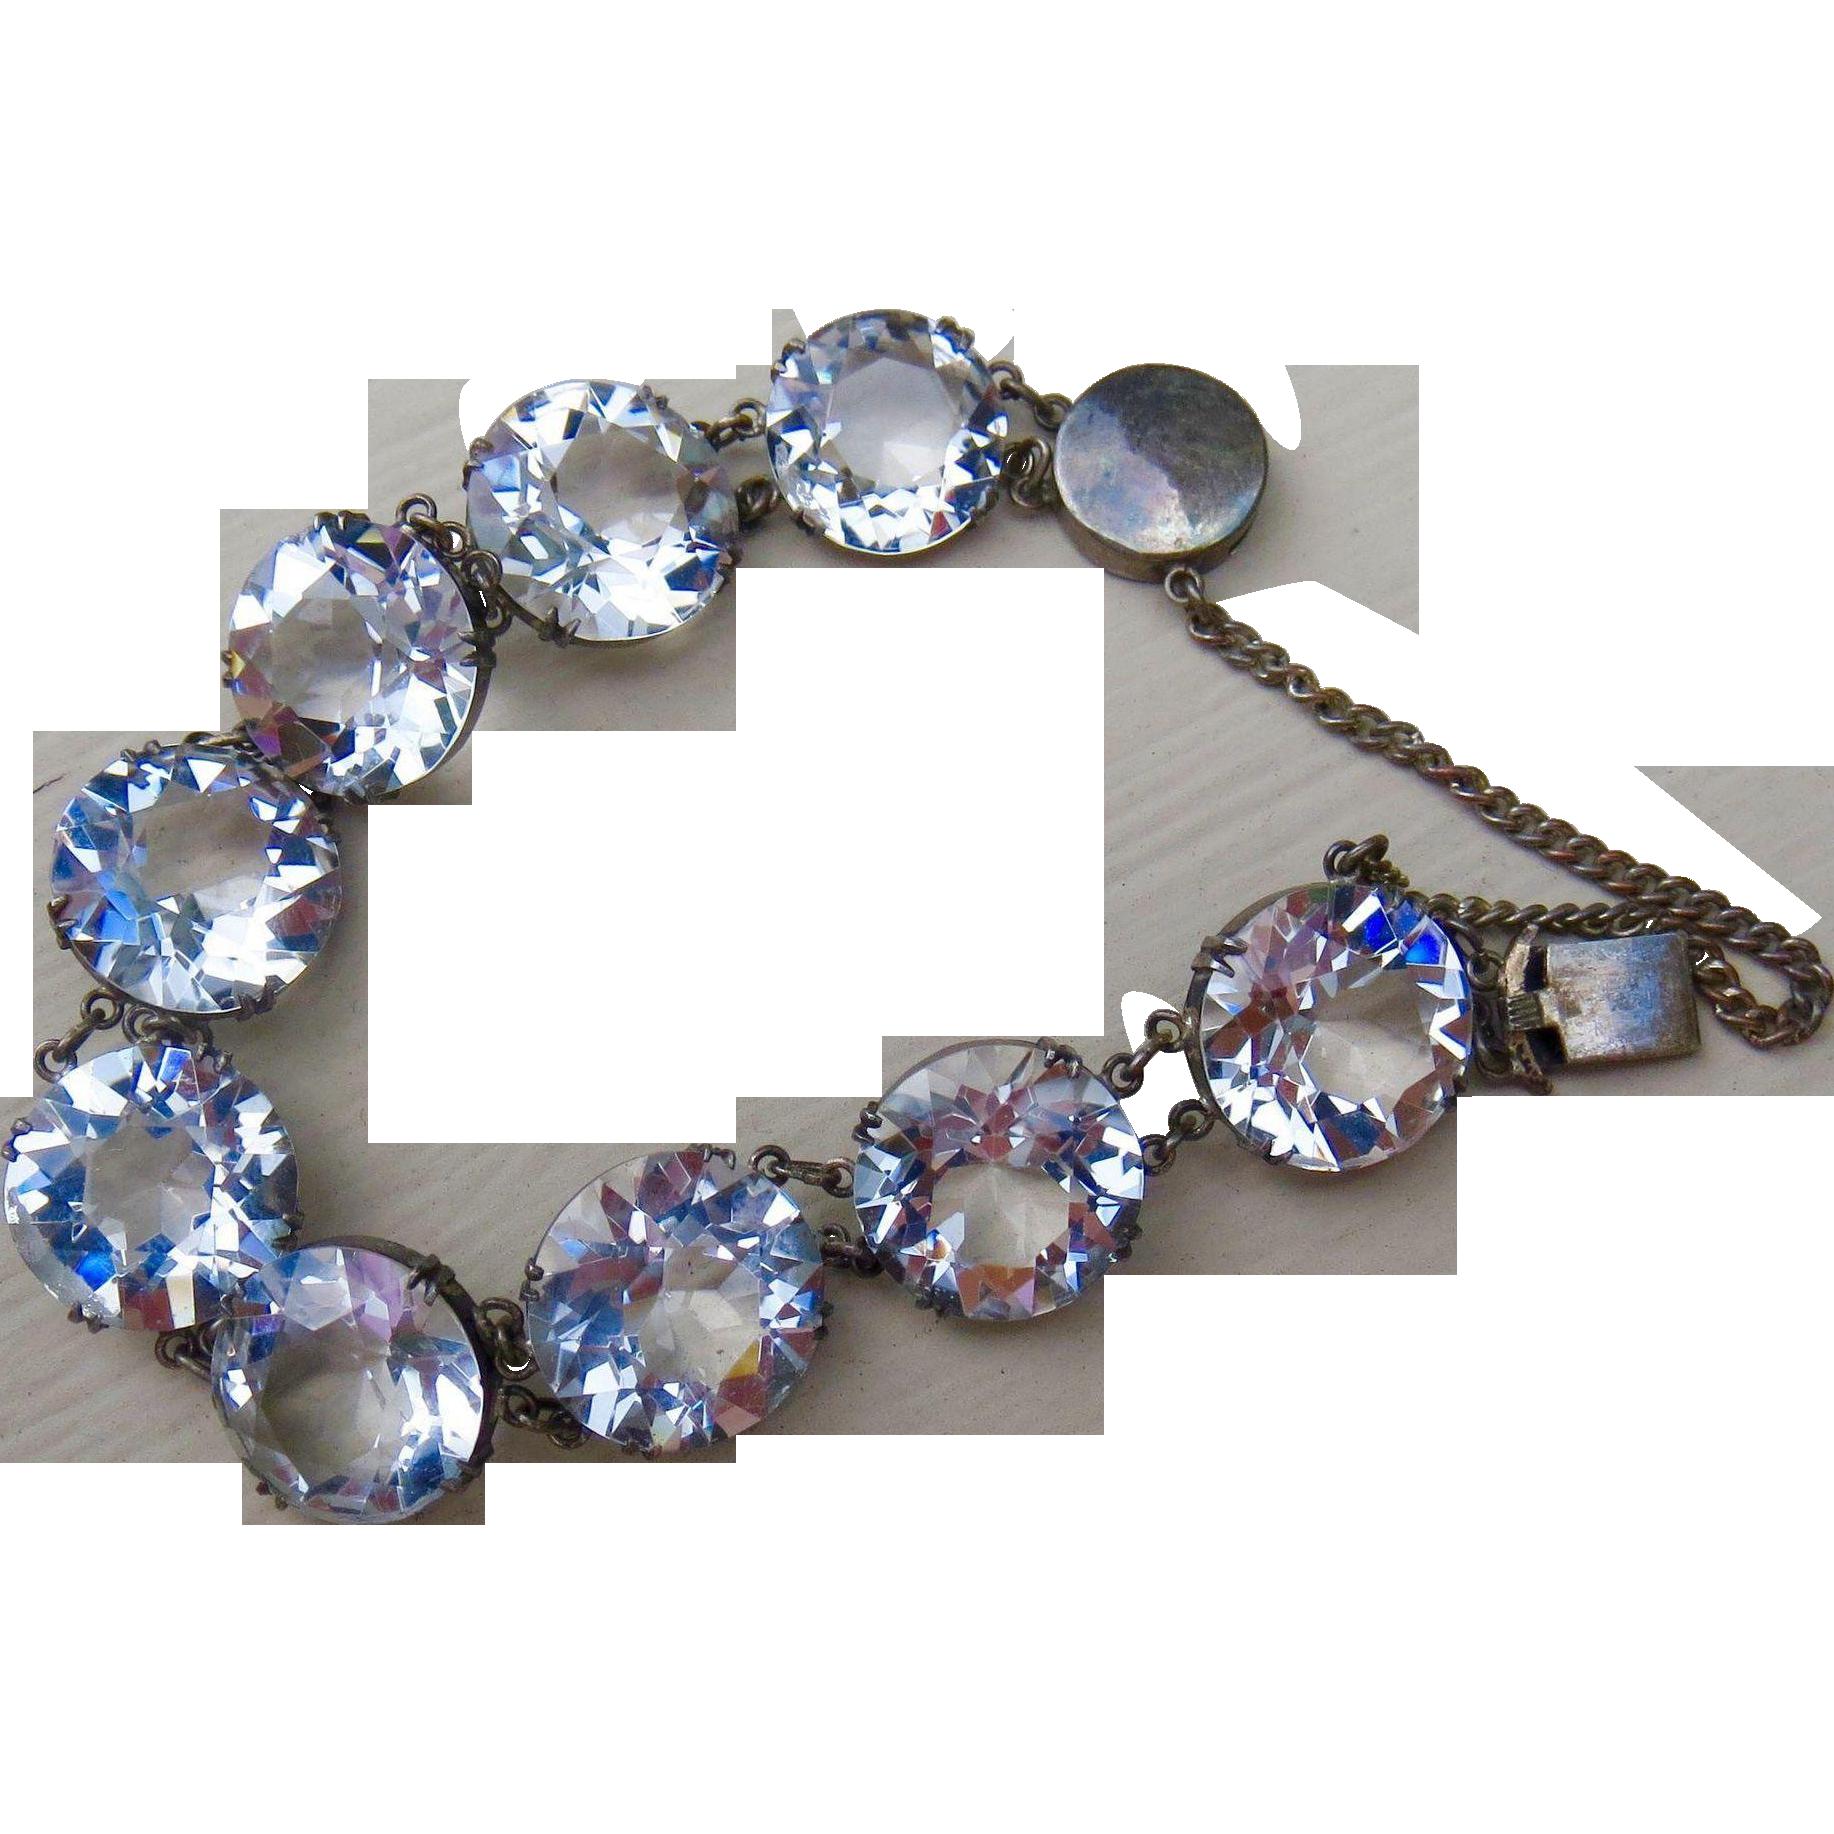 Gorgeous Japan Art Deco Large Round Faceted Rock Quart Crystal Sterling Bracelet Over 60 carats!